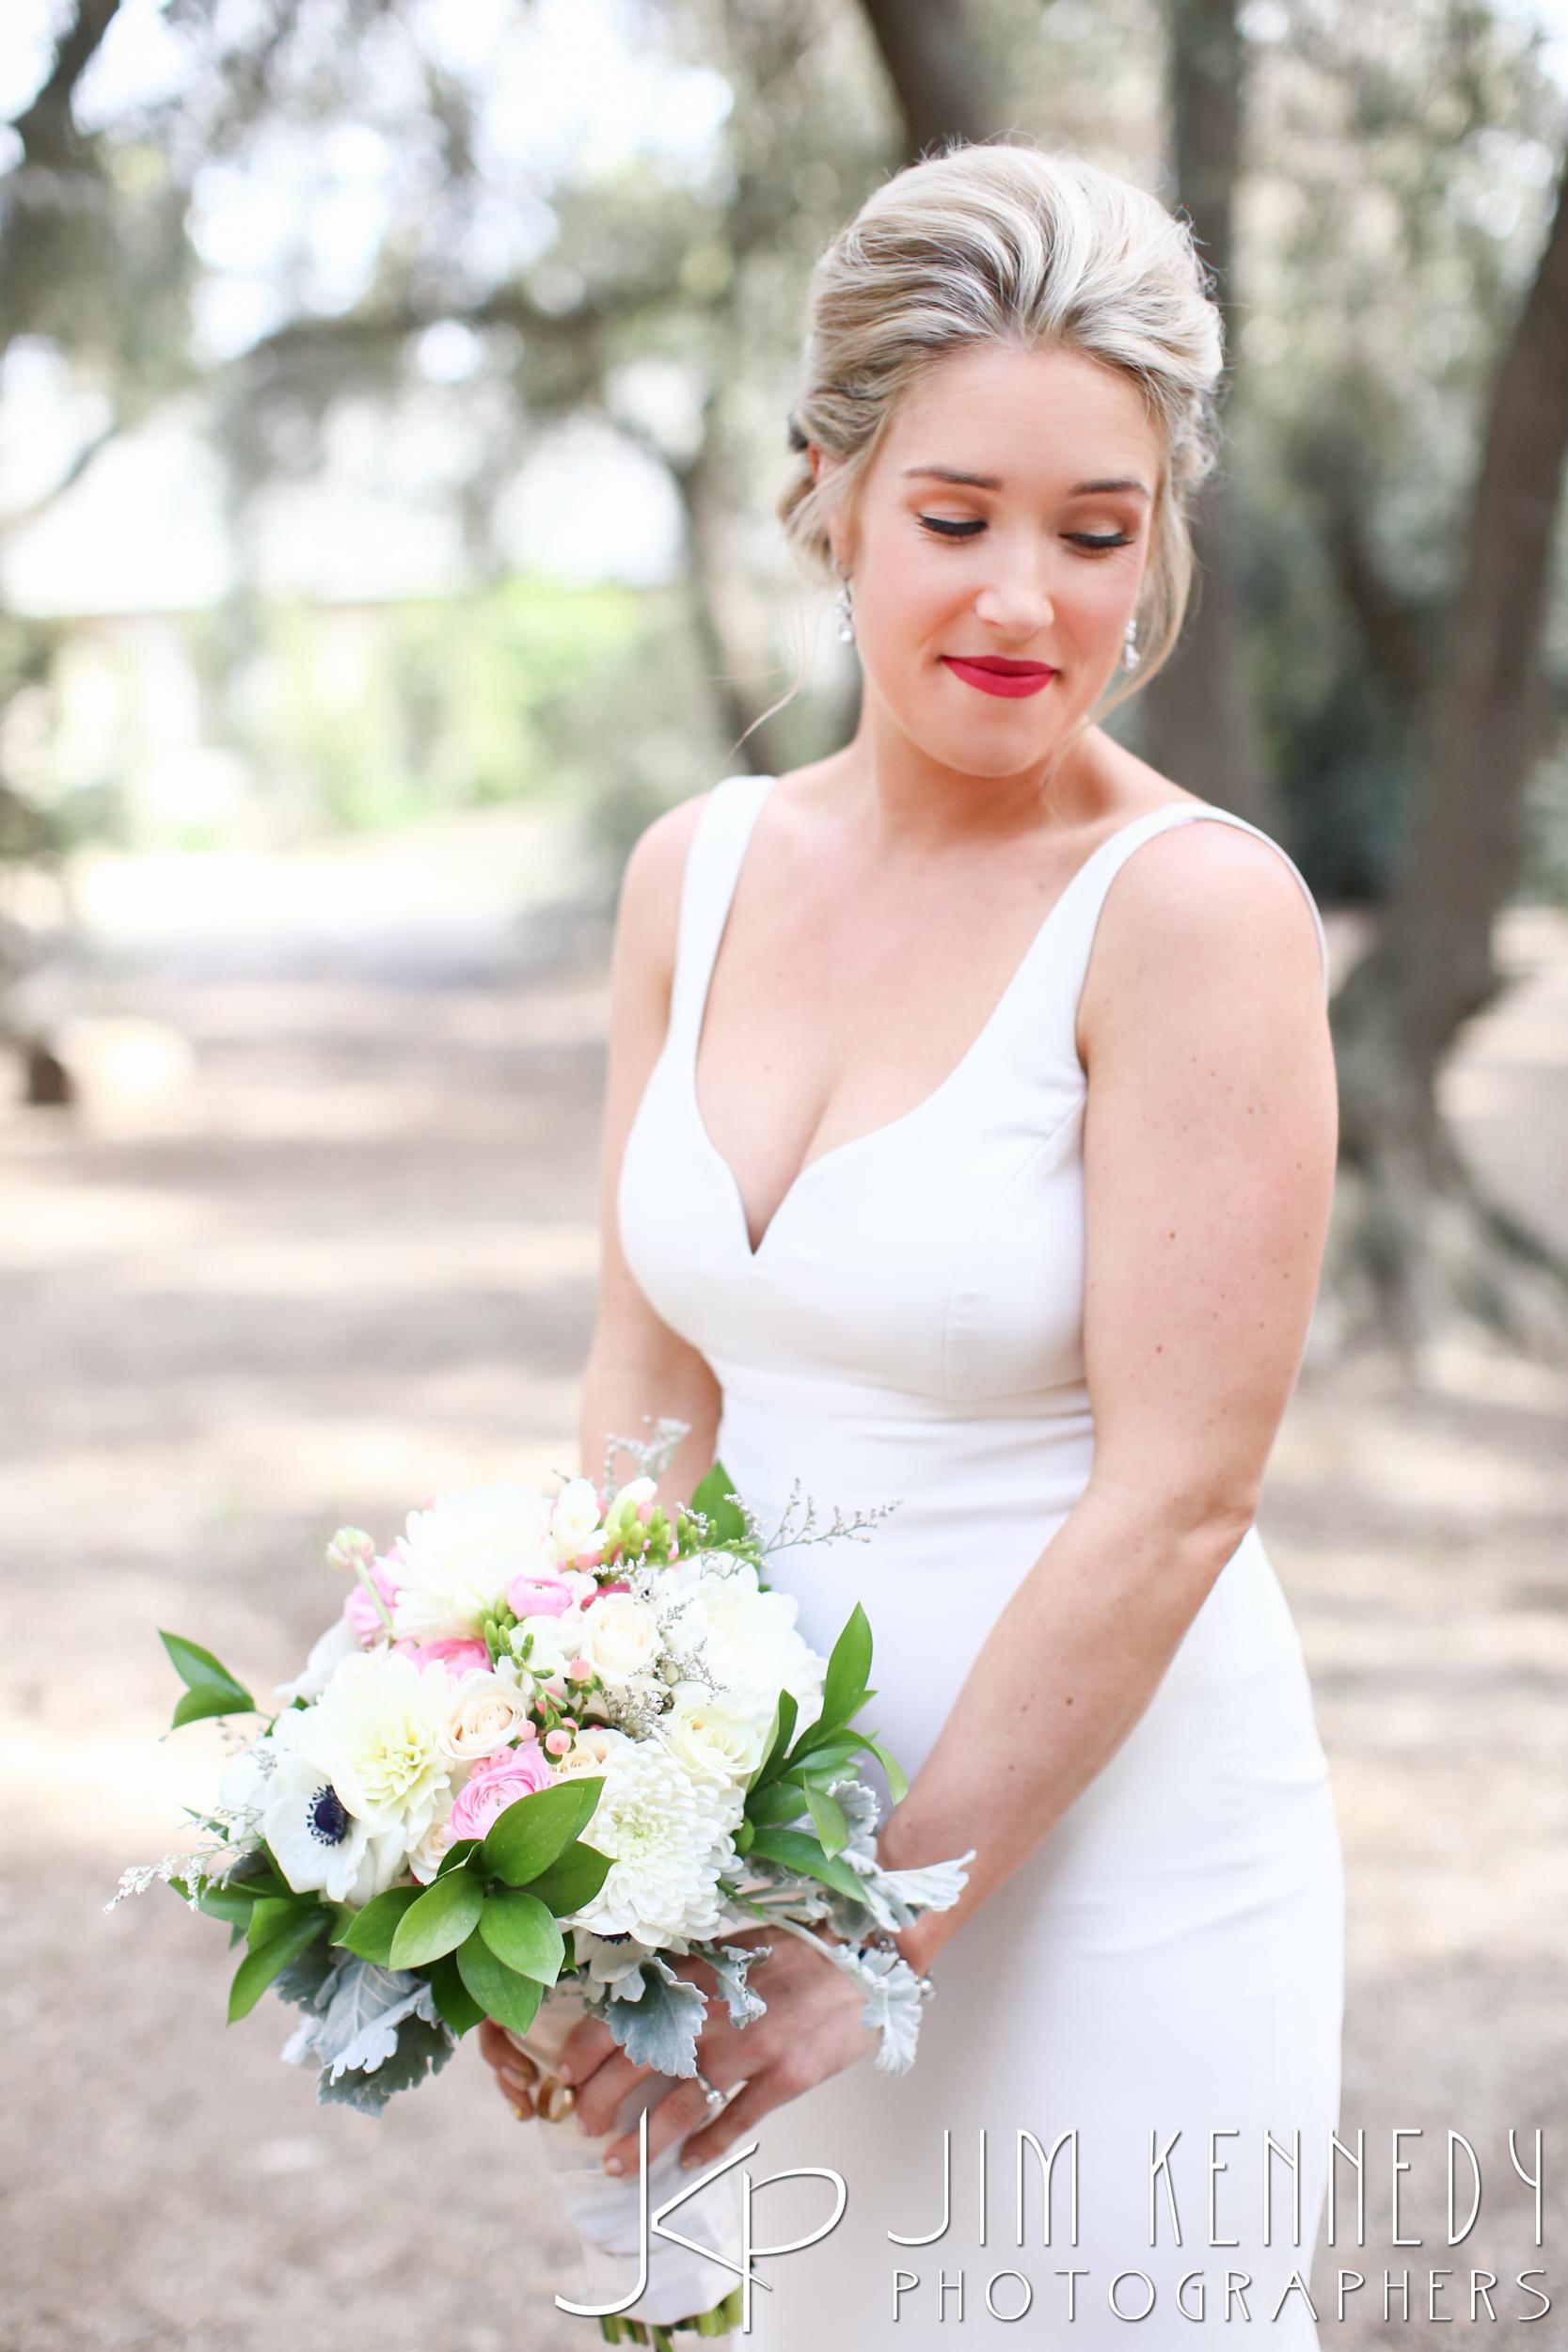 jim_kennedy_photographers_highland_springs_wedding_caitlyn_0052.jpg